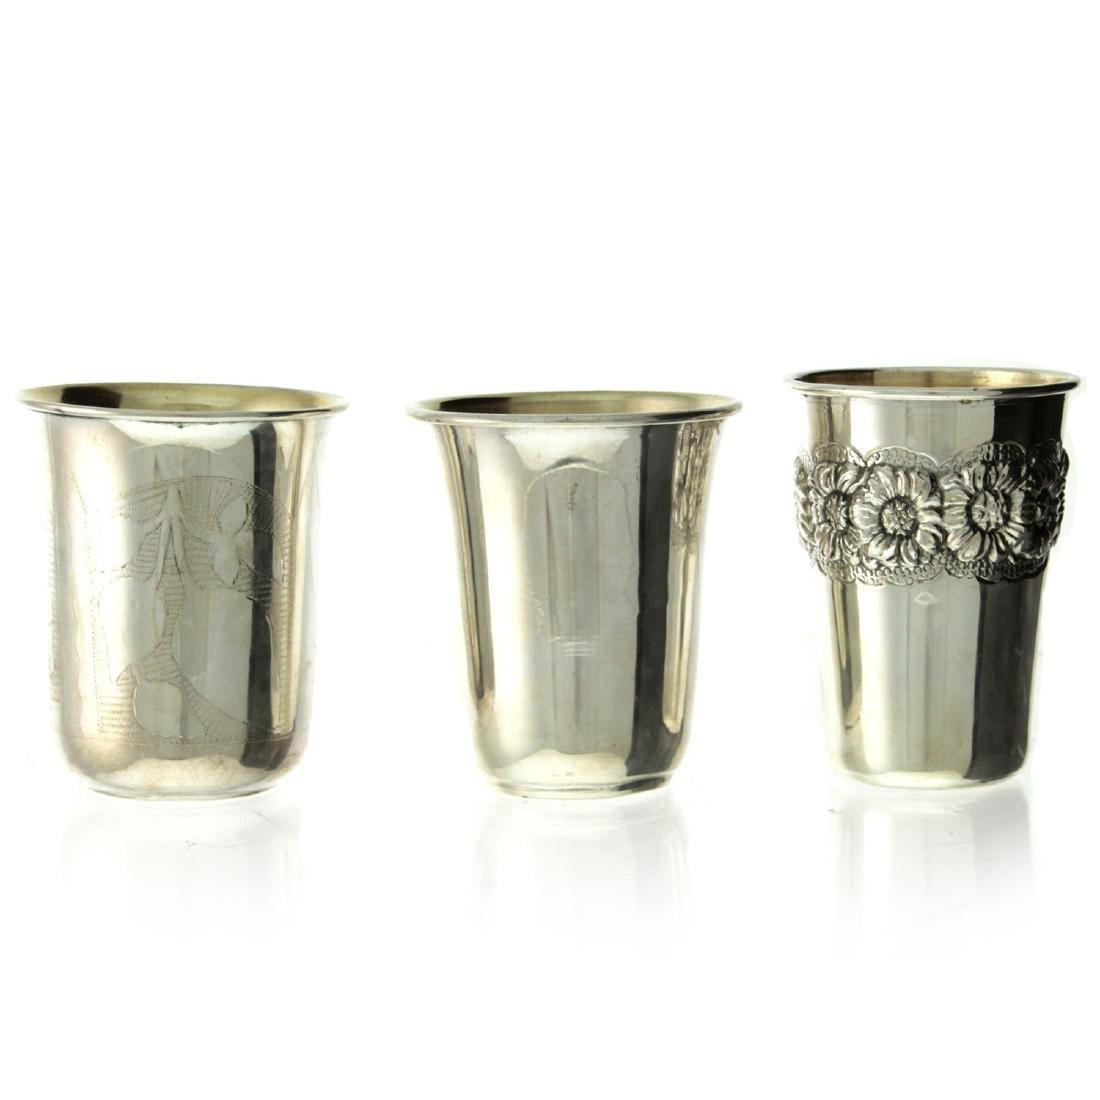 Three Sterling Silver Kiddush Cups.